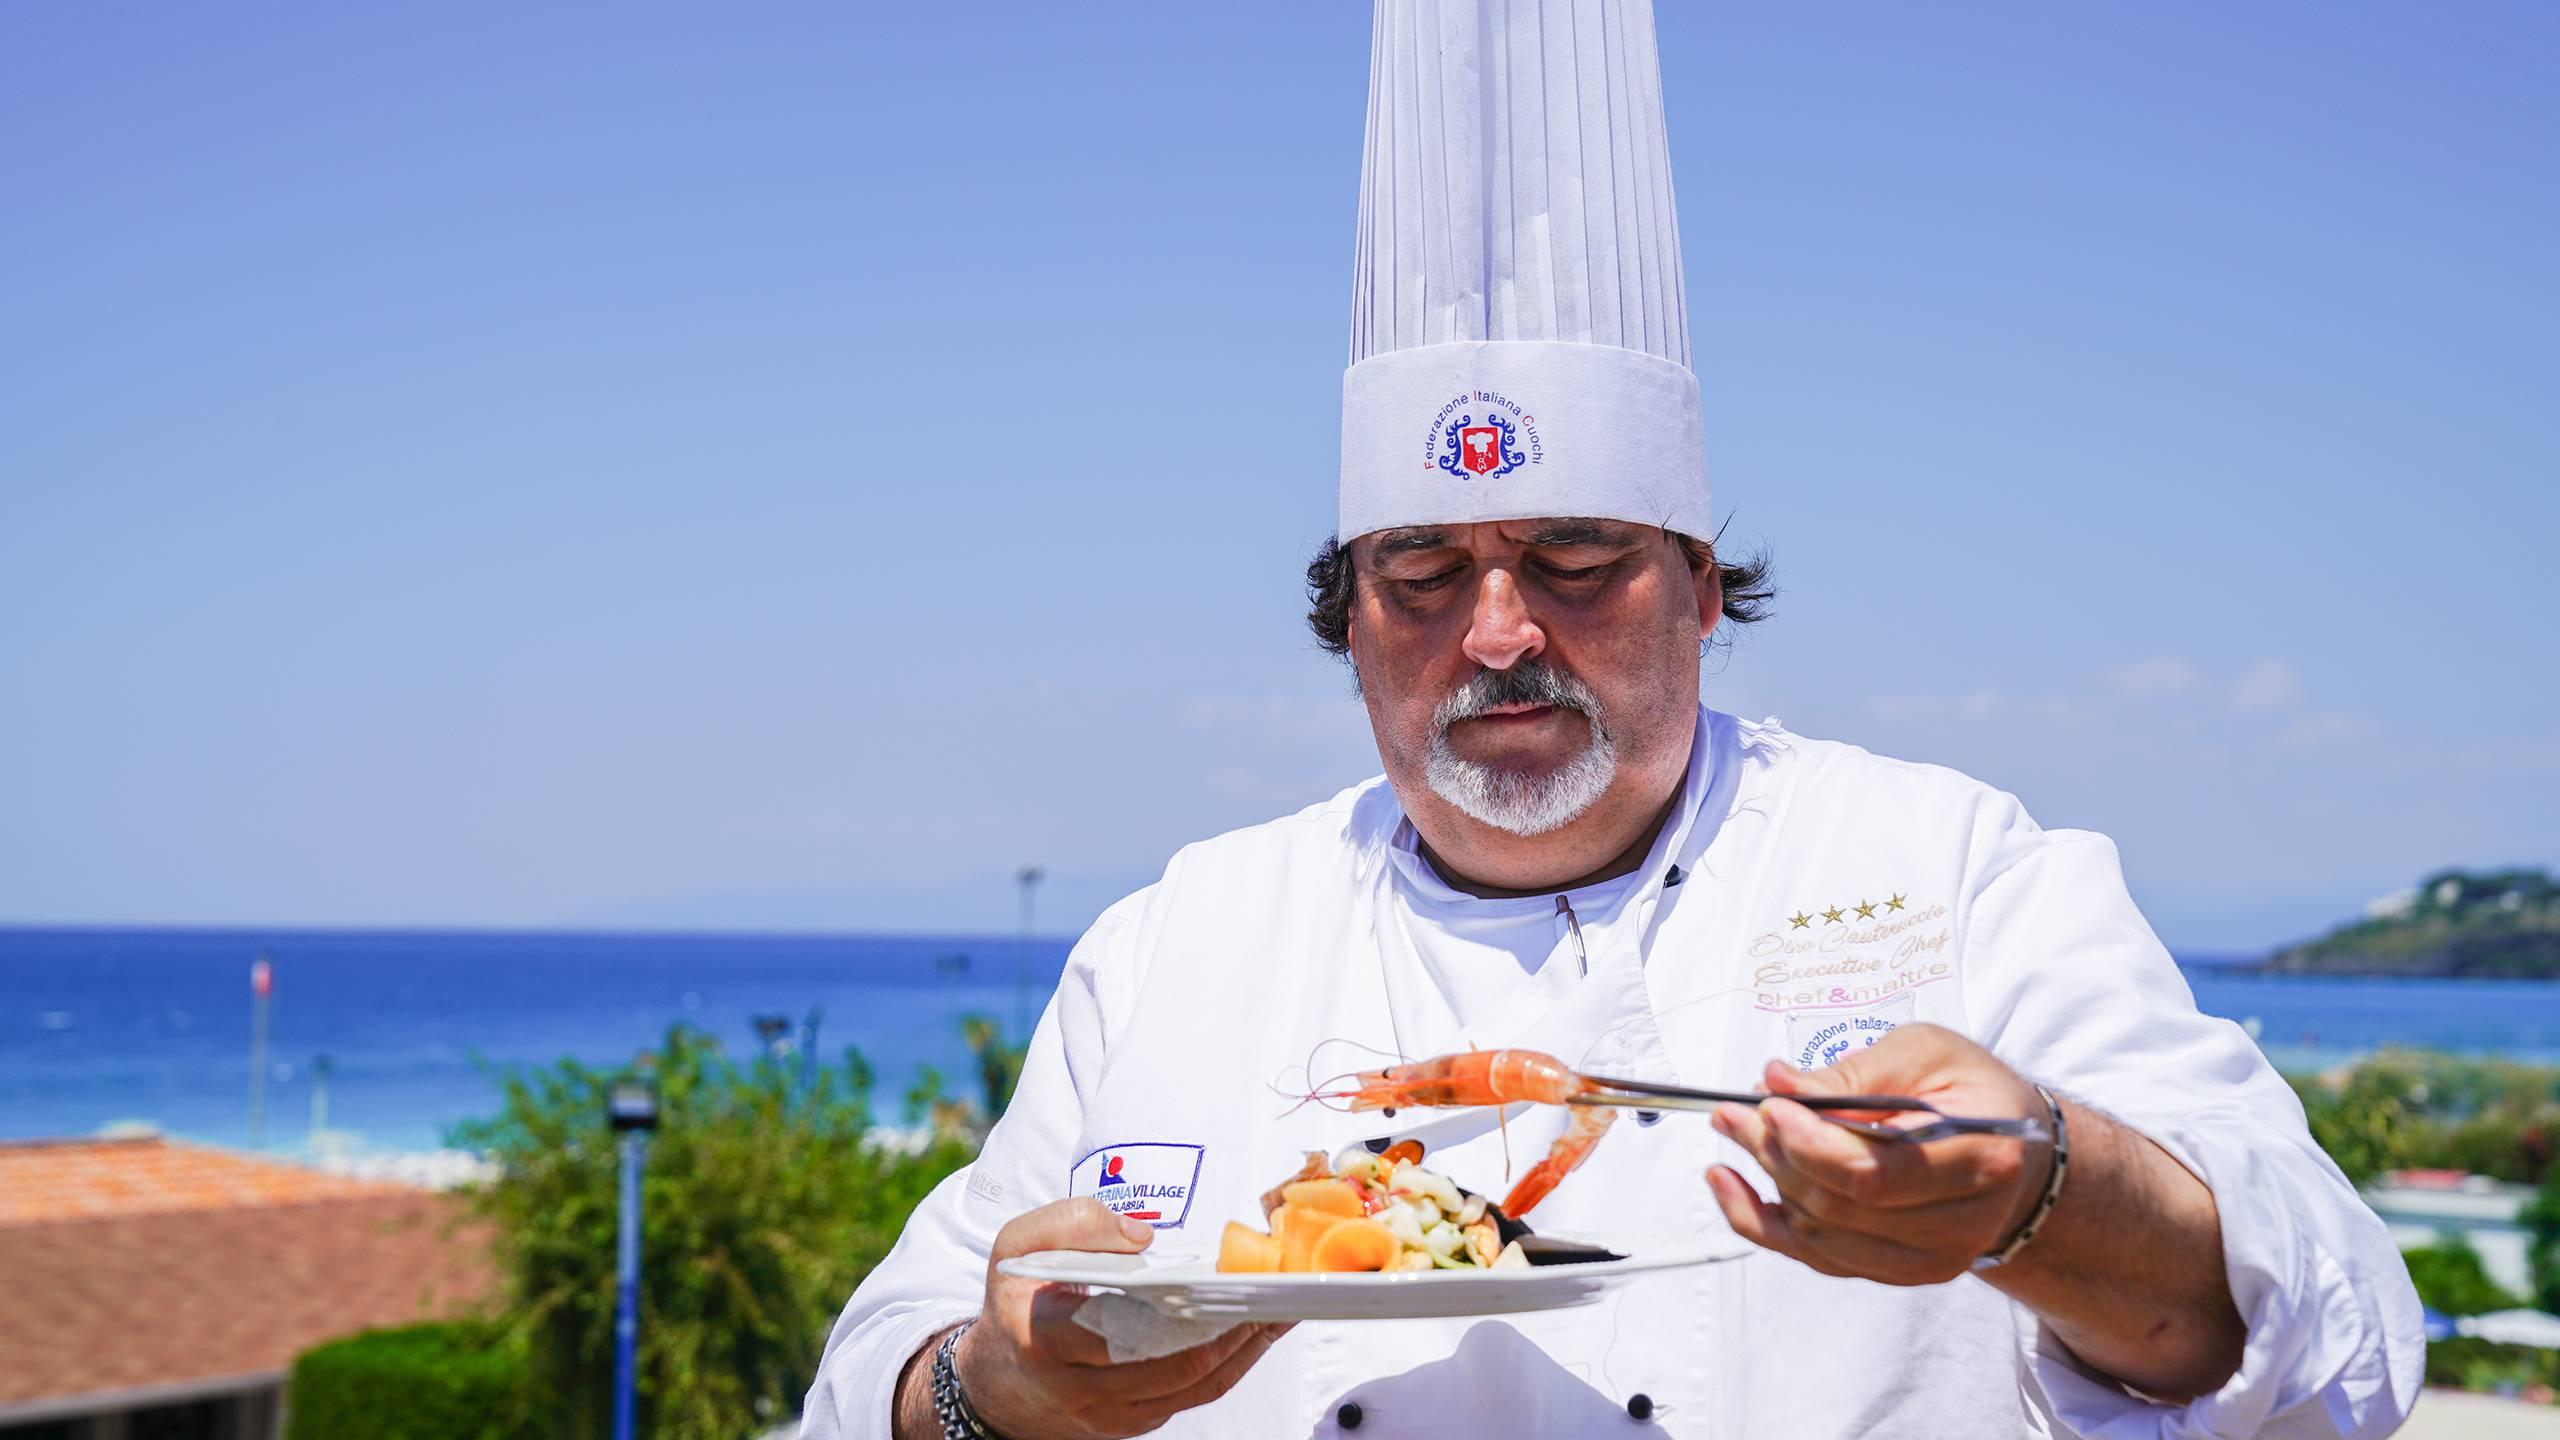 Santa-Caterina-Village-Scalea-restaurant-chef-ecrevisse-DSC00918